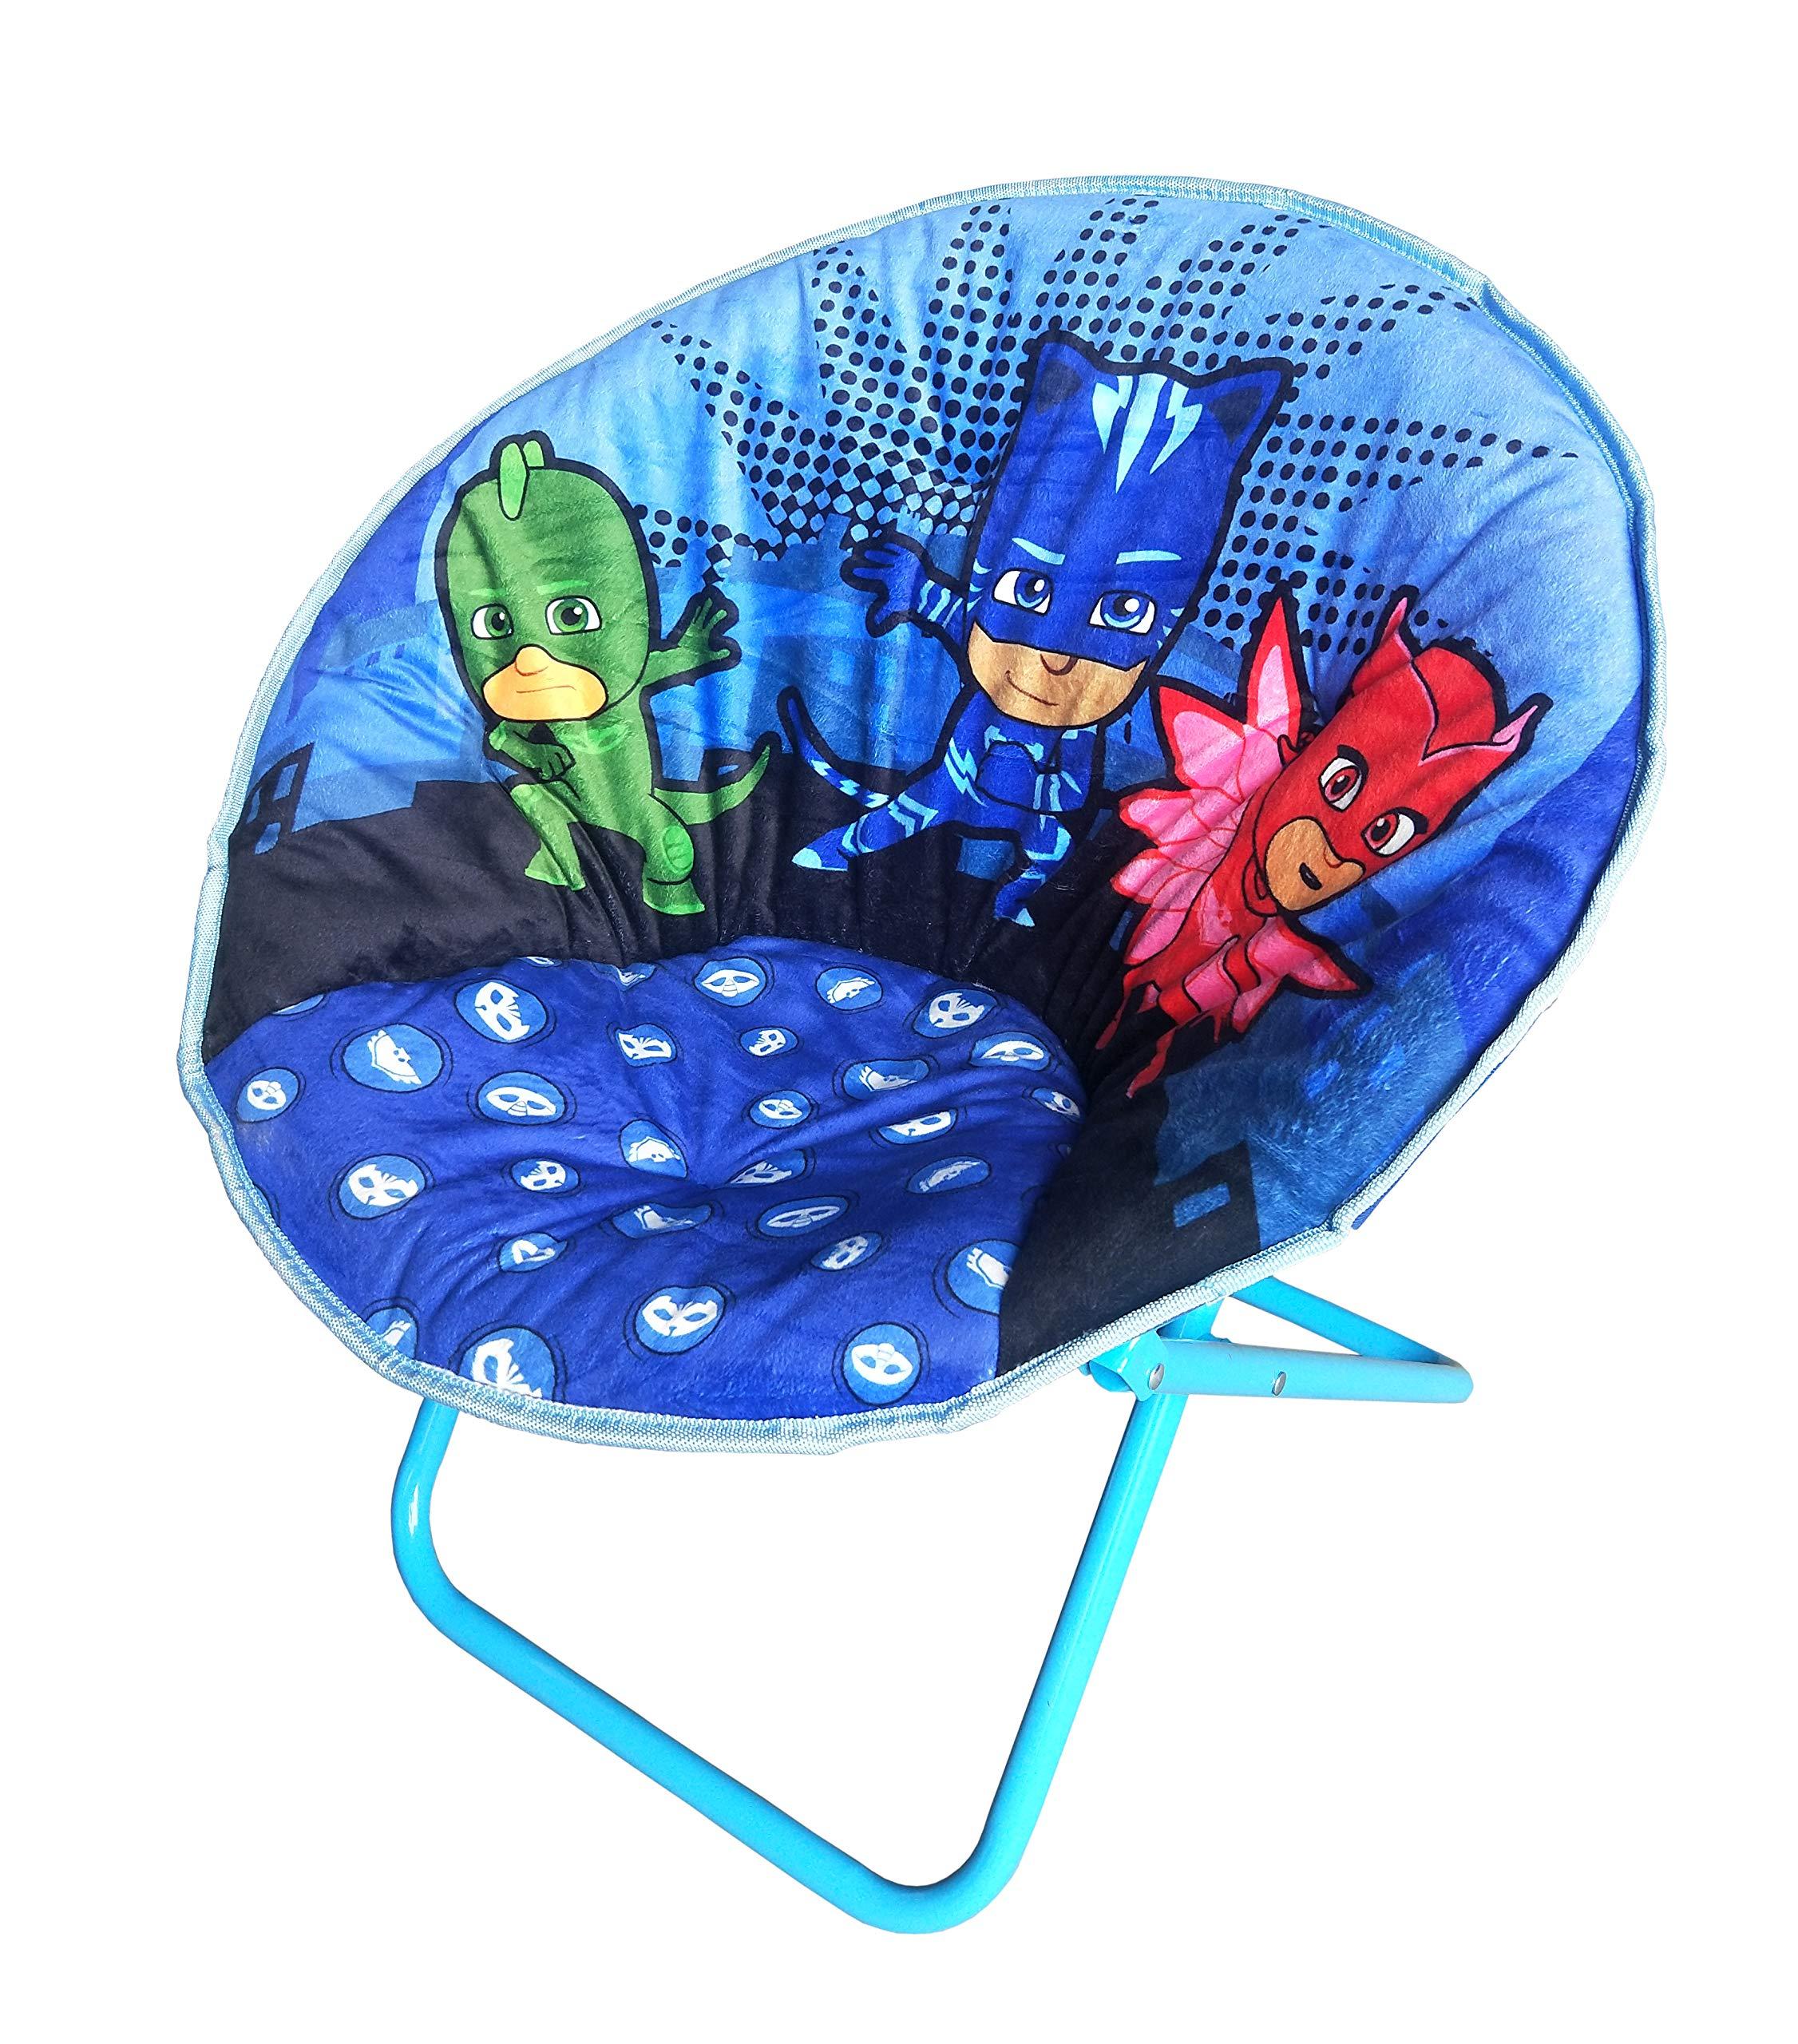 Entertainment 1 PJ Mask Kids Saucer Chair by Entertainment 1